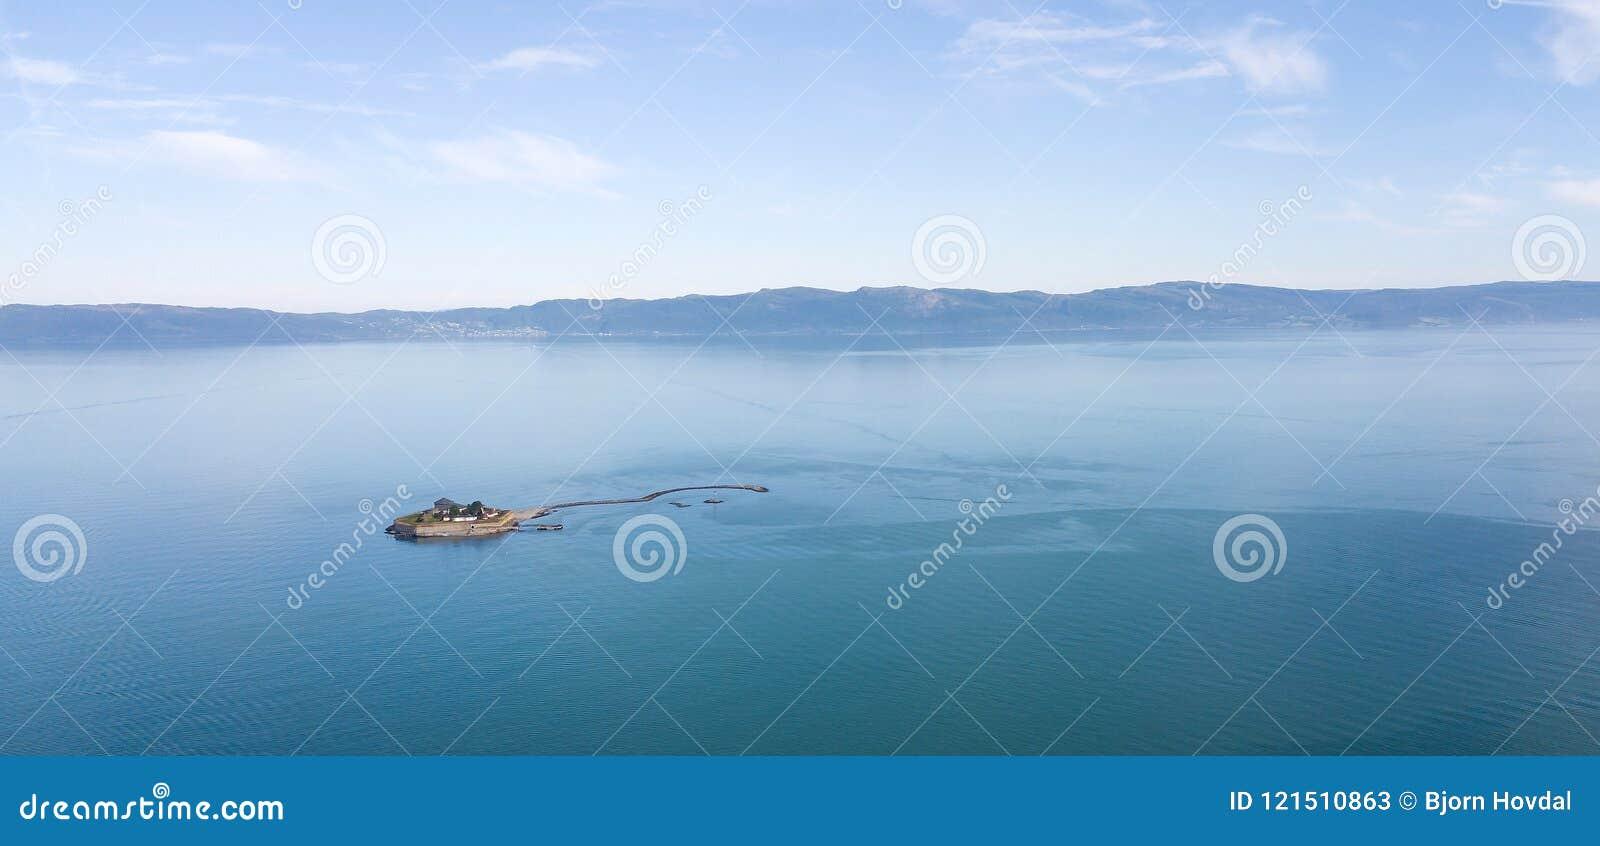 Foto aérea del islote de Munkholmen en el Trondheimsfjord